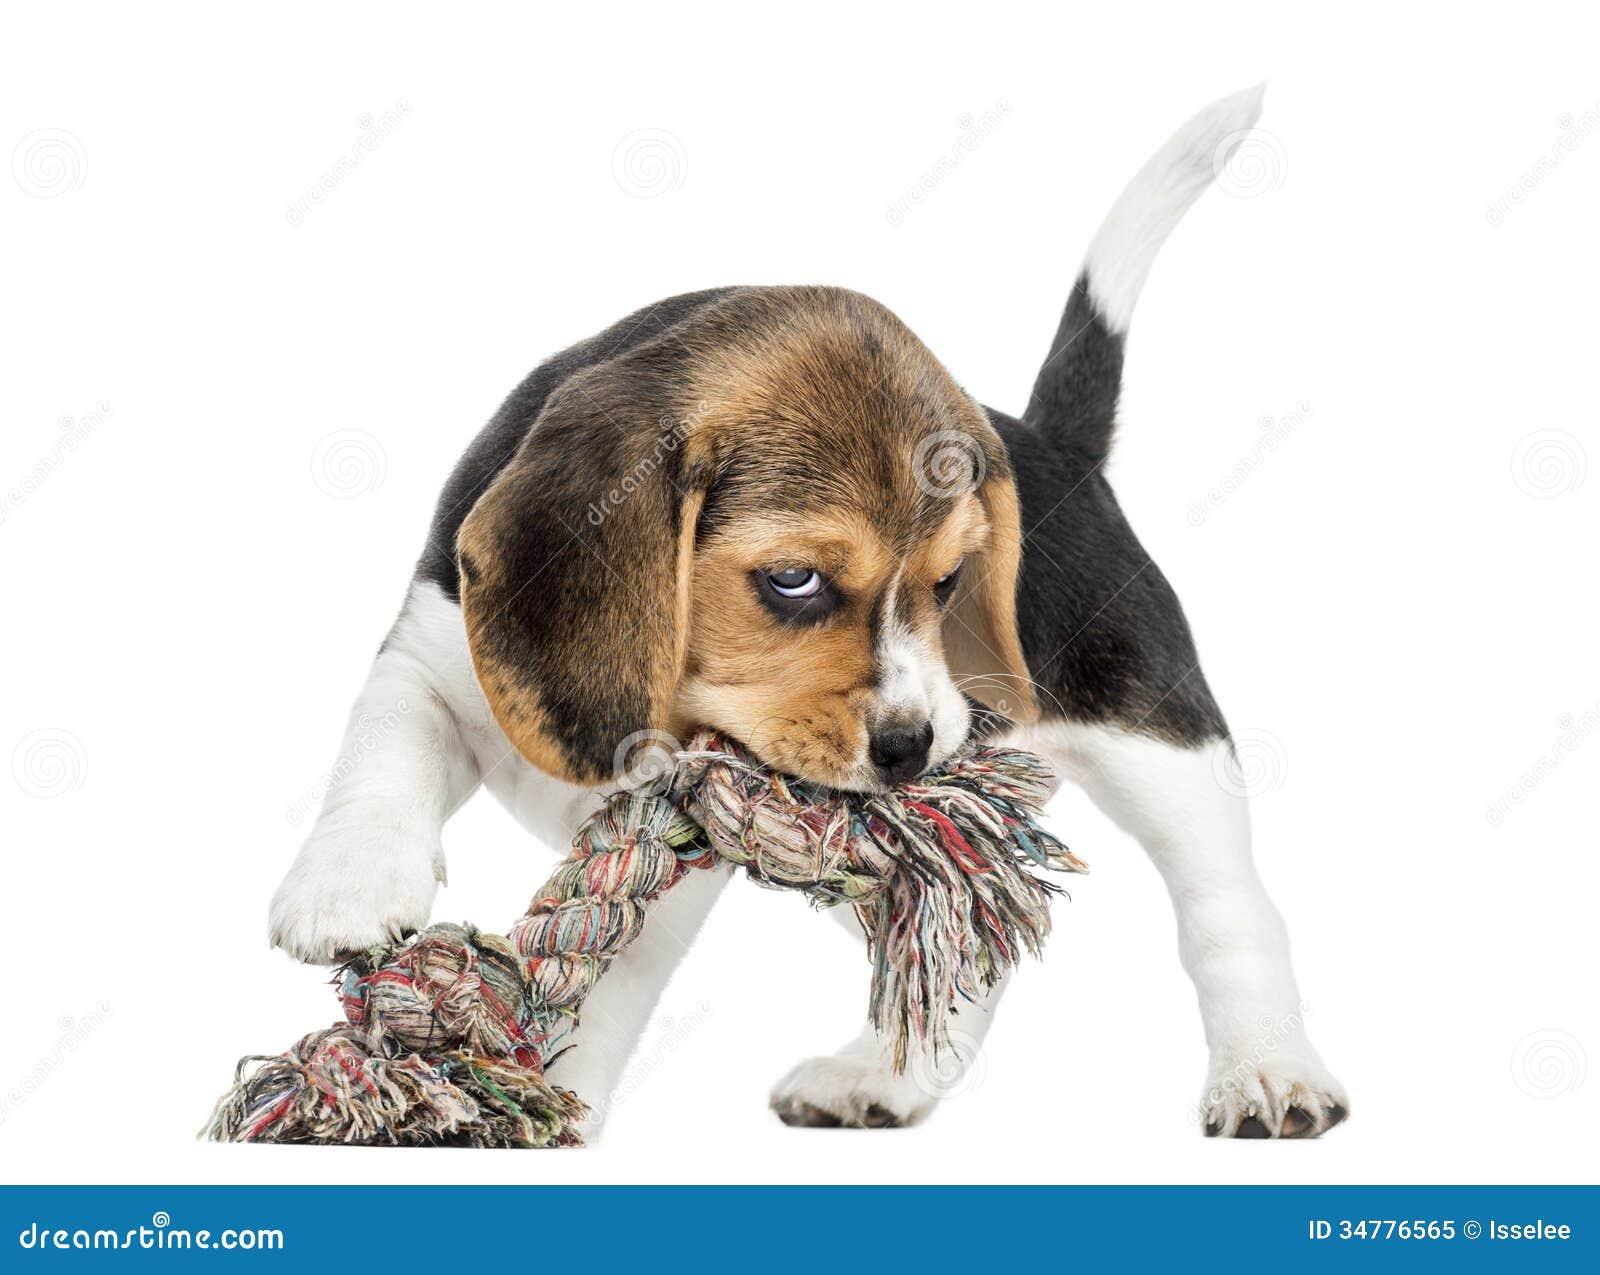 Främre sikt av en beaglevalp som biter en repleksak som isoleras